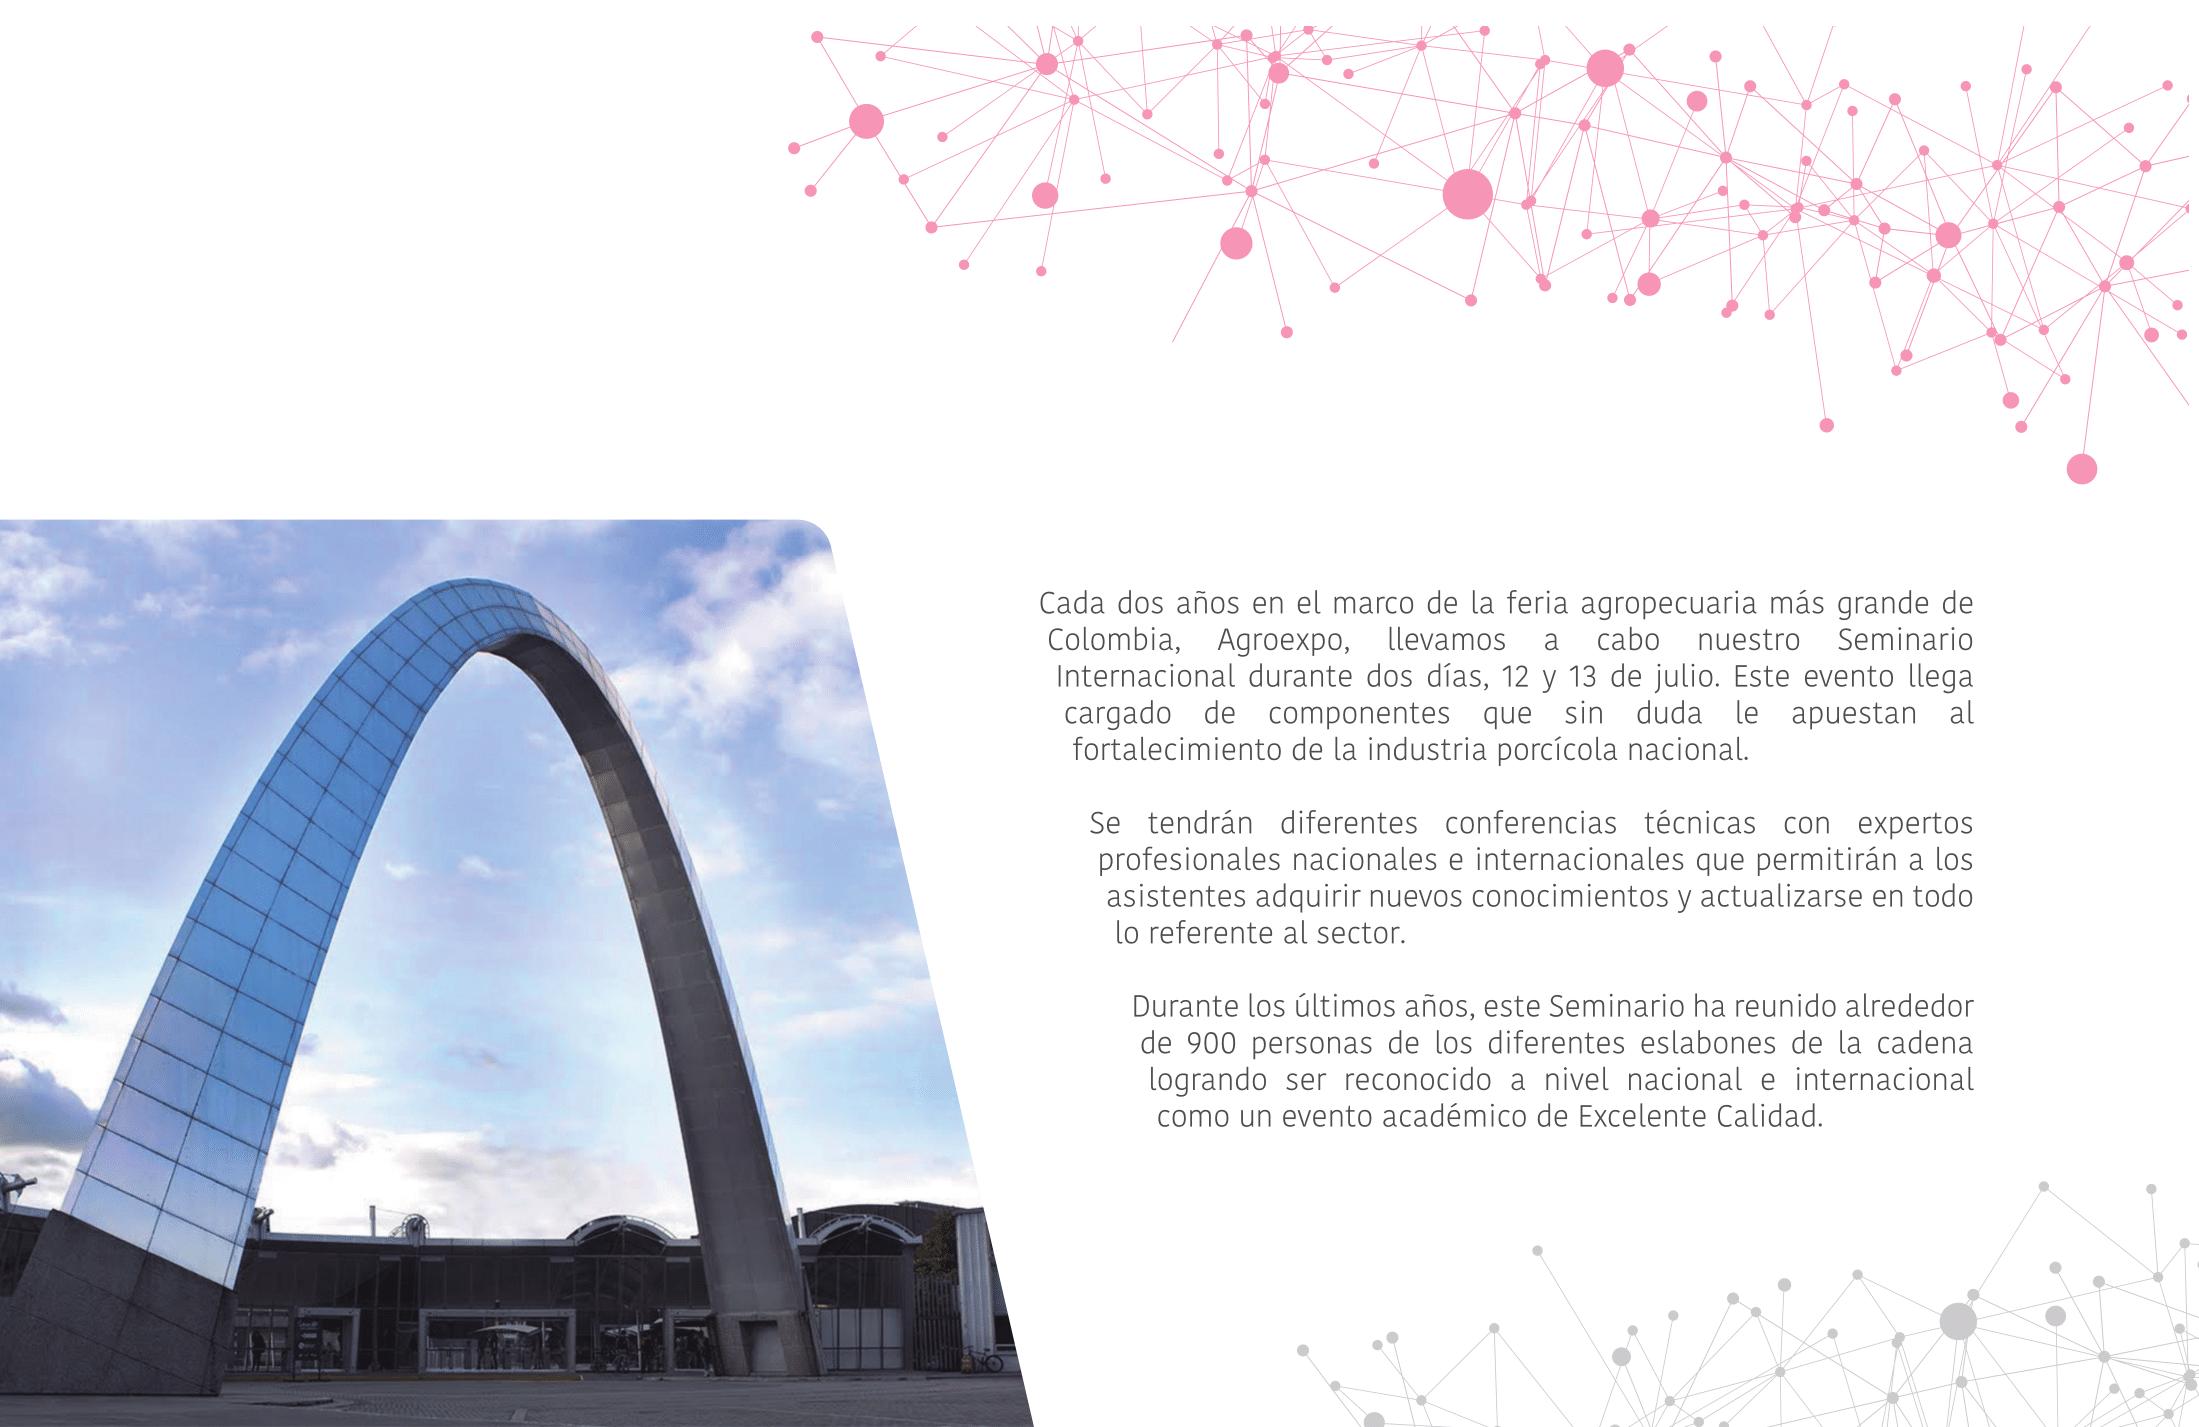 https://www.porkcolombia.co/wp-content/uploads/2019/02/Porkcalidad2019_Corferias-1.png